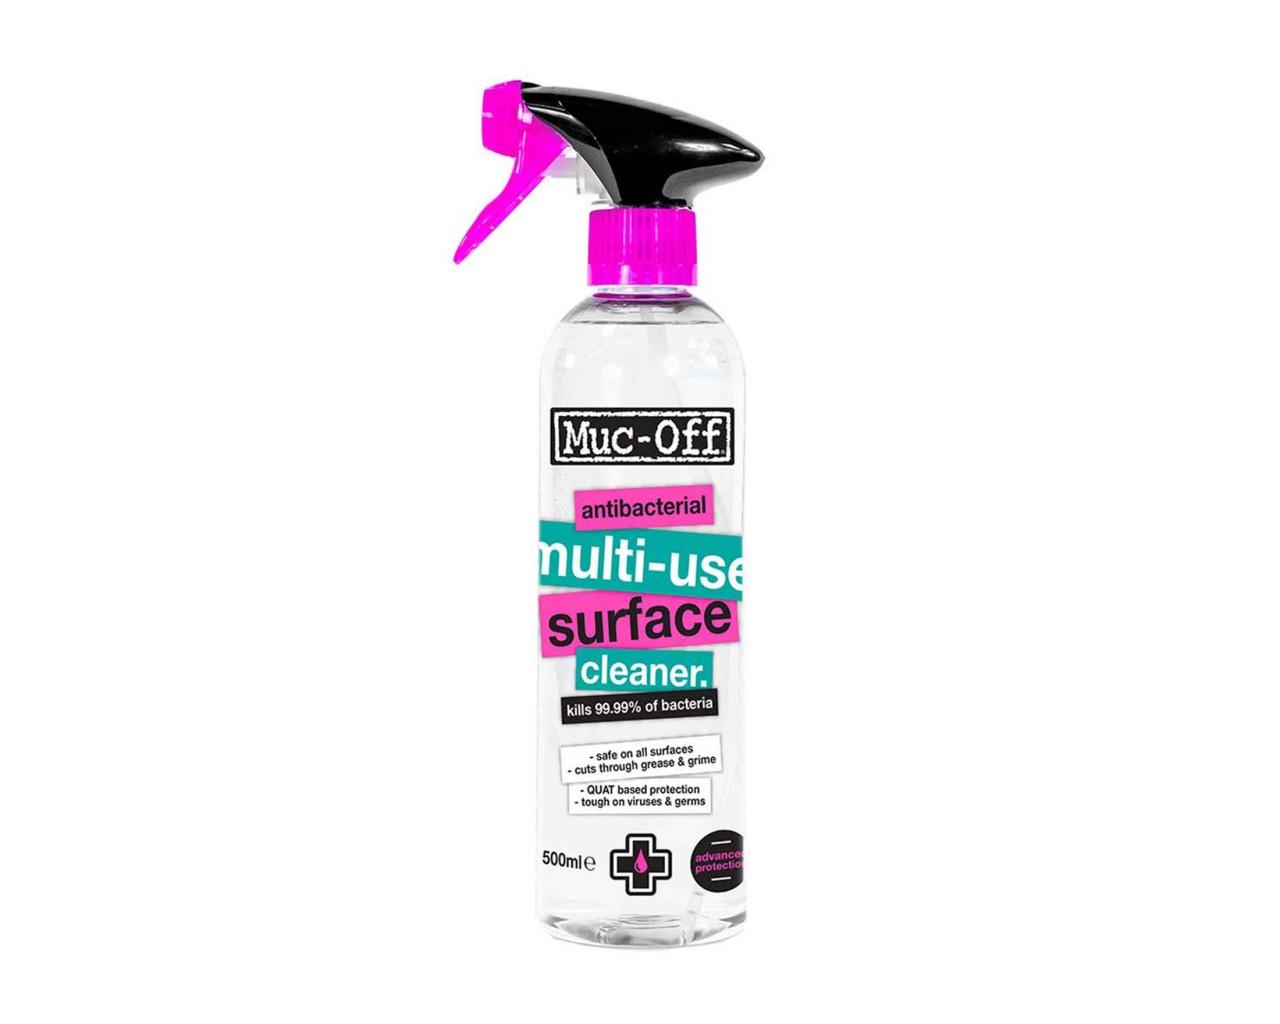 Muc-Off Antibakterieller Mehrzweck-Oberflächenreiniger 500ml